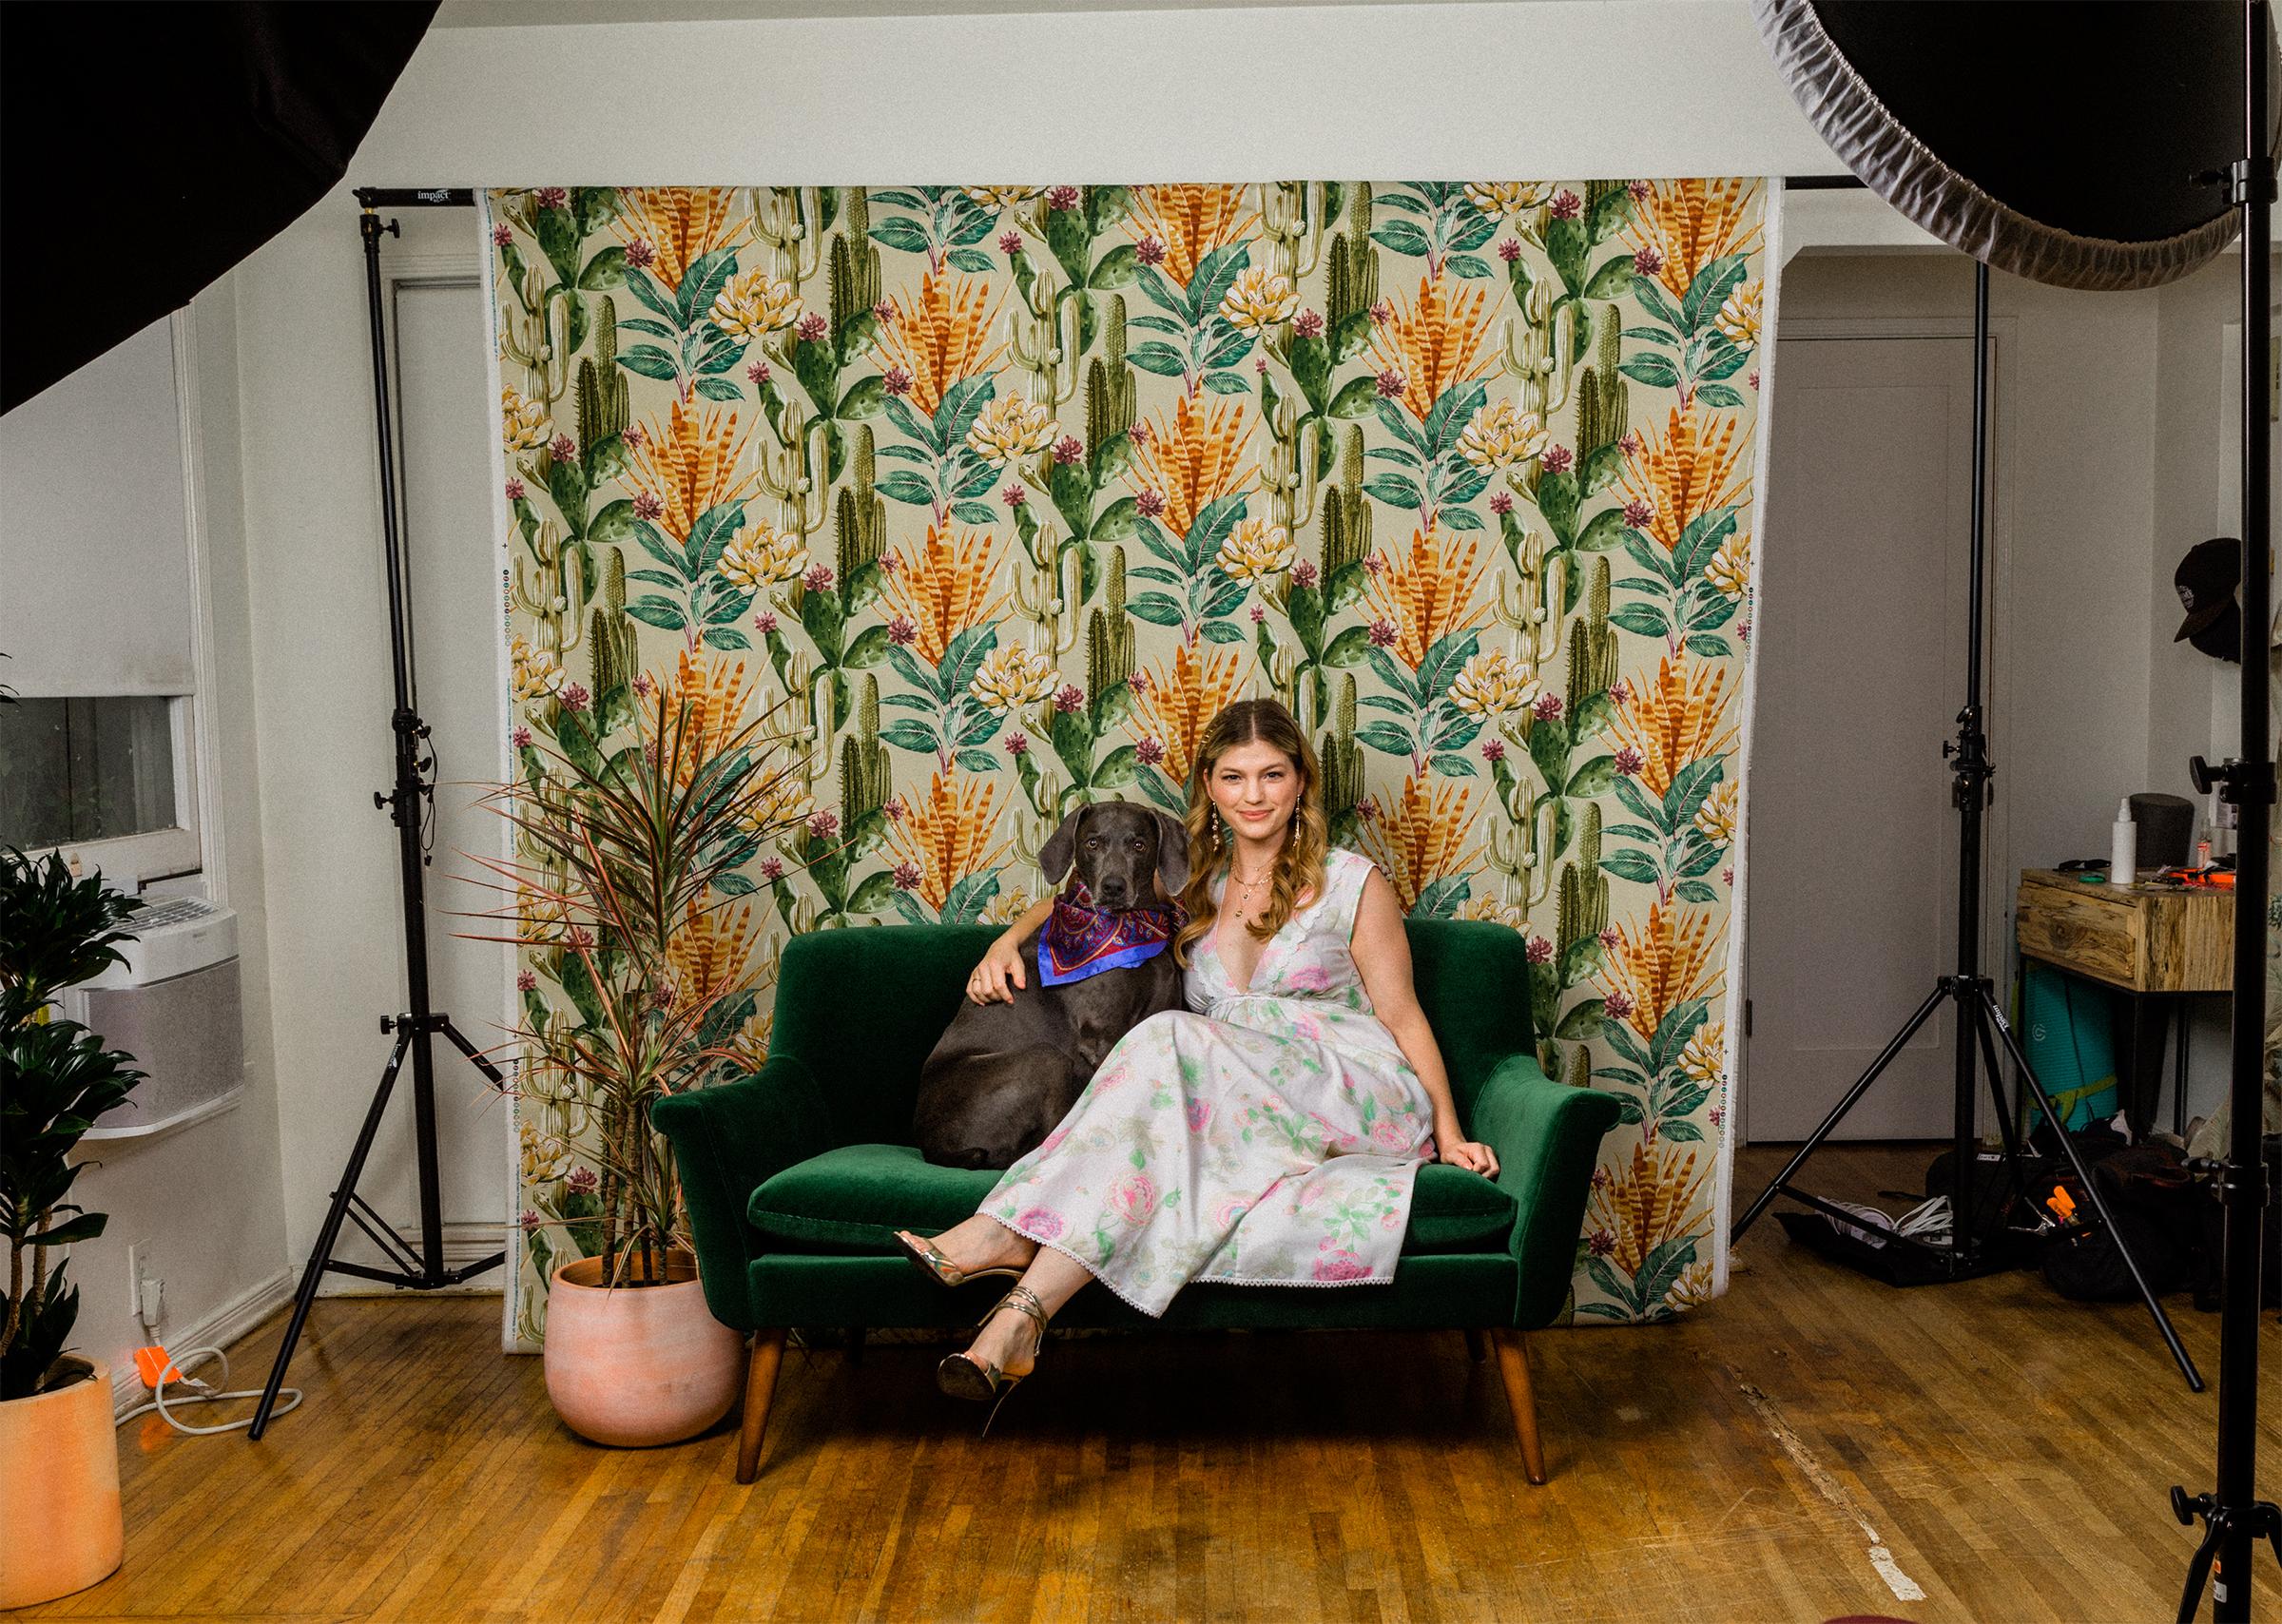 20190929_Pet Portraits_Danielle Spires-0723.jpg